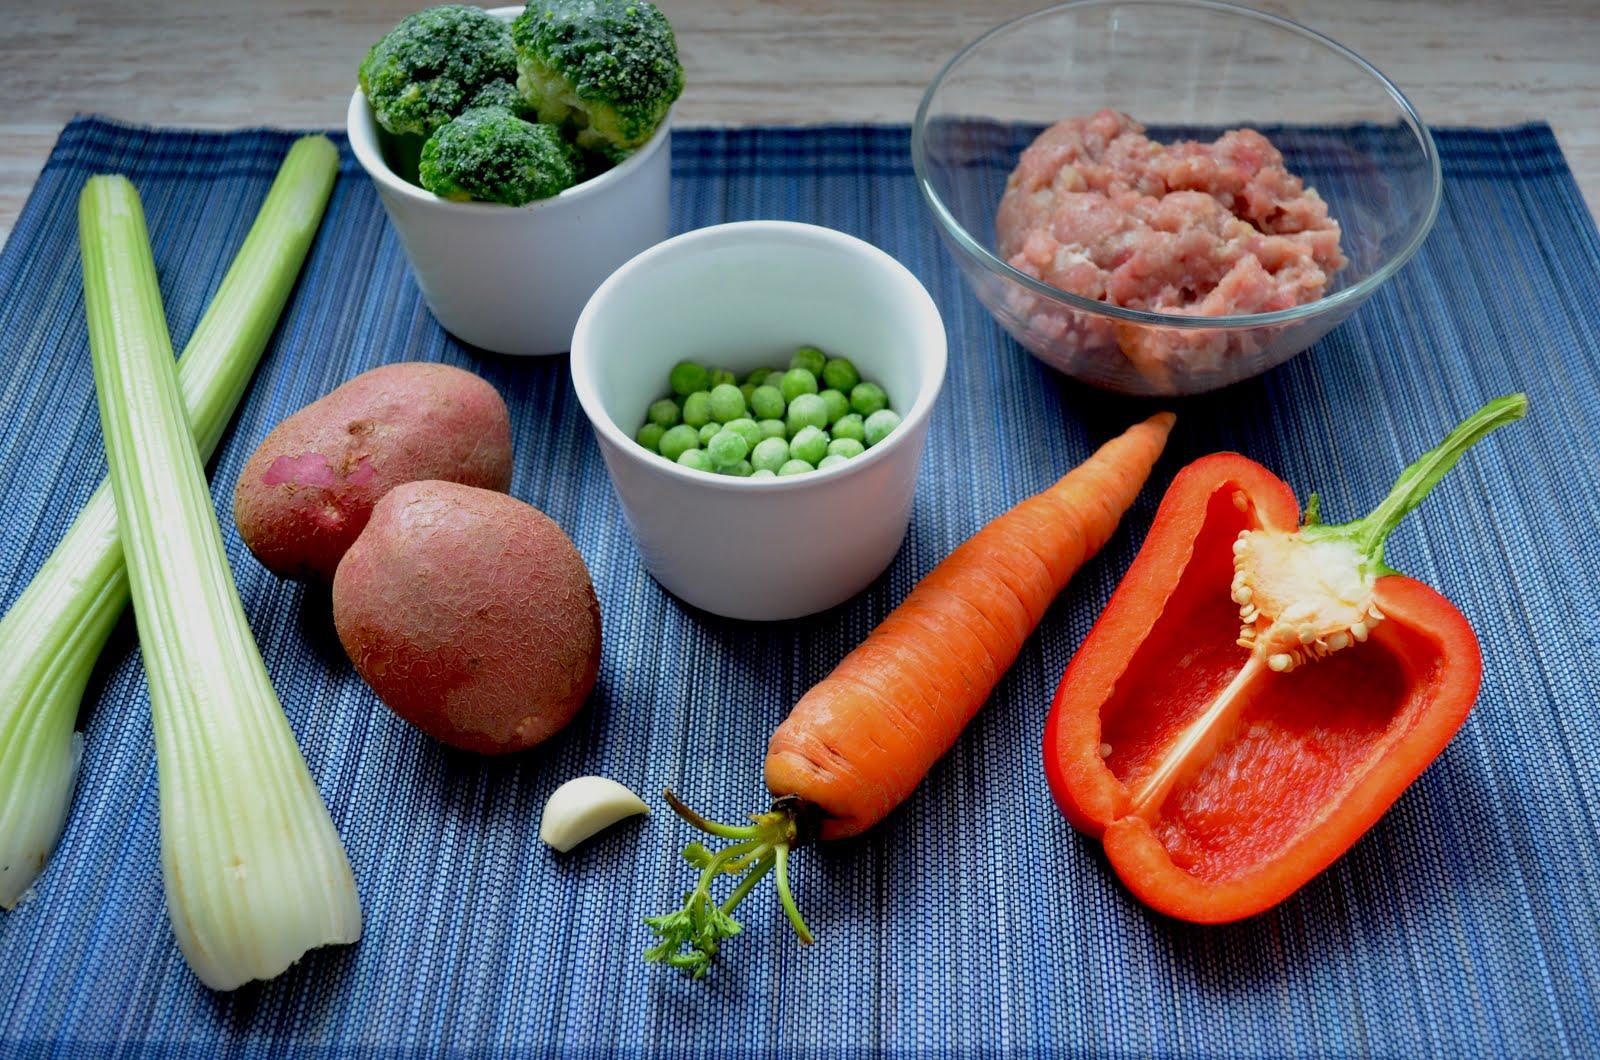 Ела одни овощи похудела